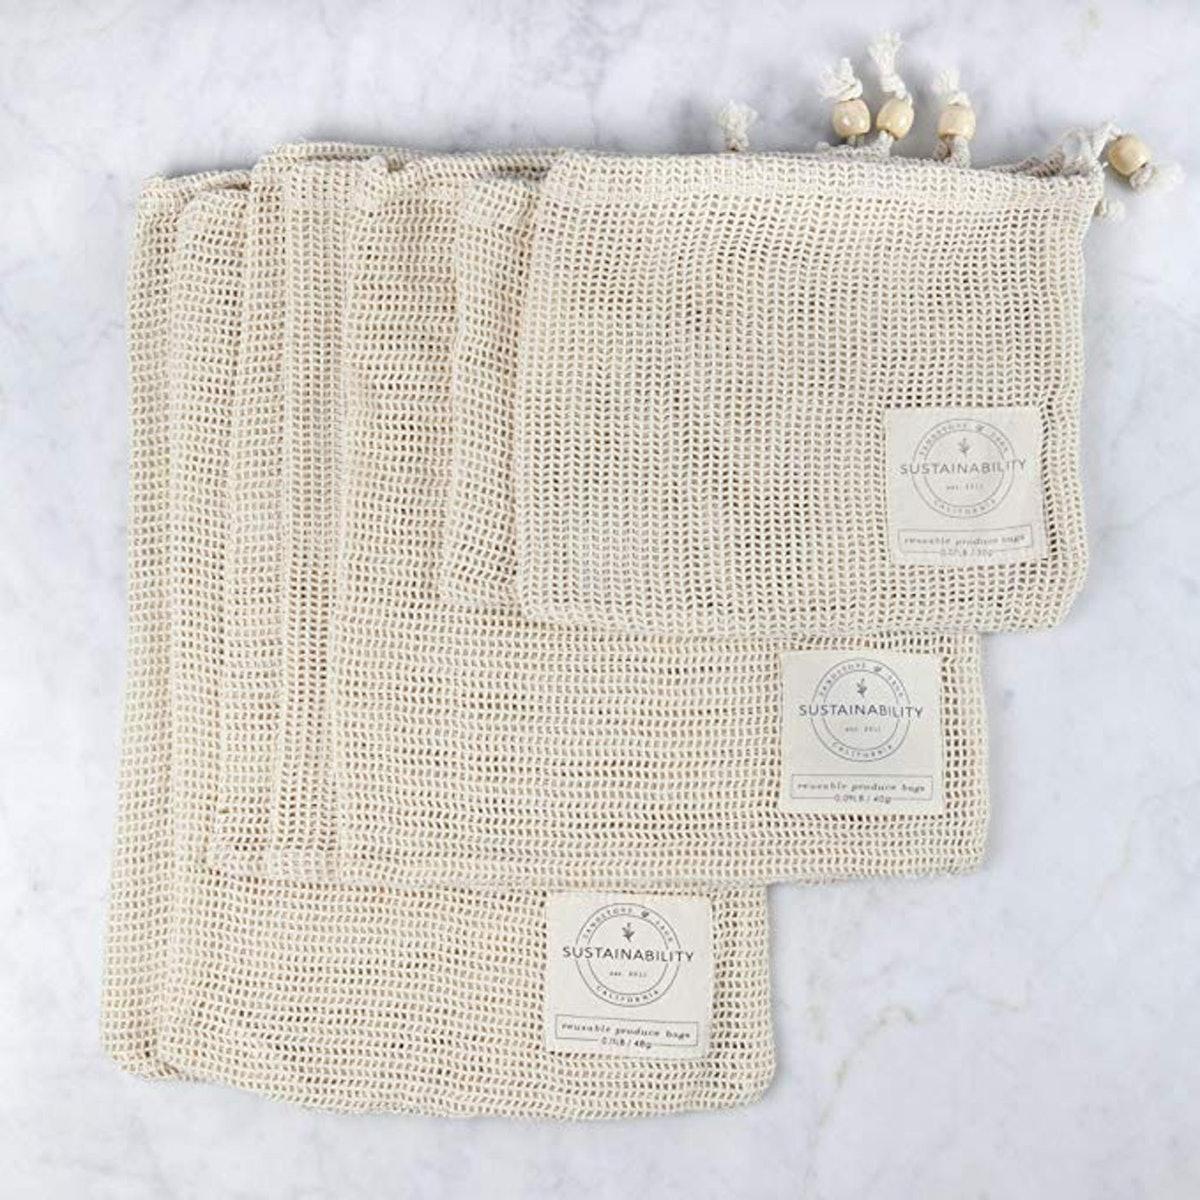 Sandstone & Sage Reusable Produce Bags (7-Pack)